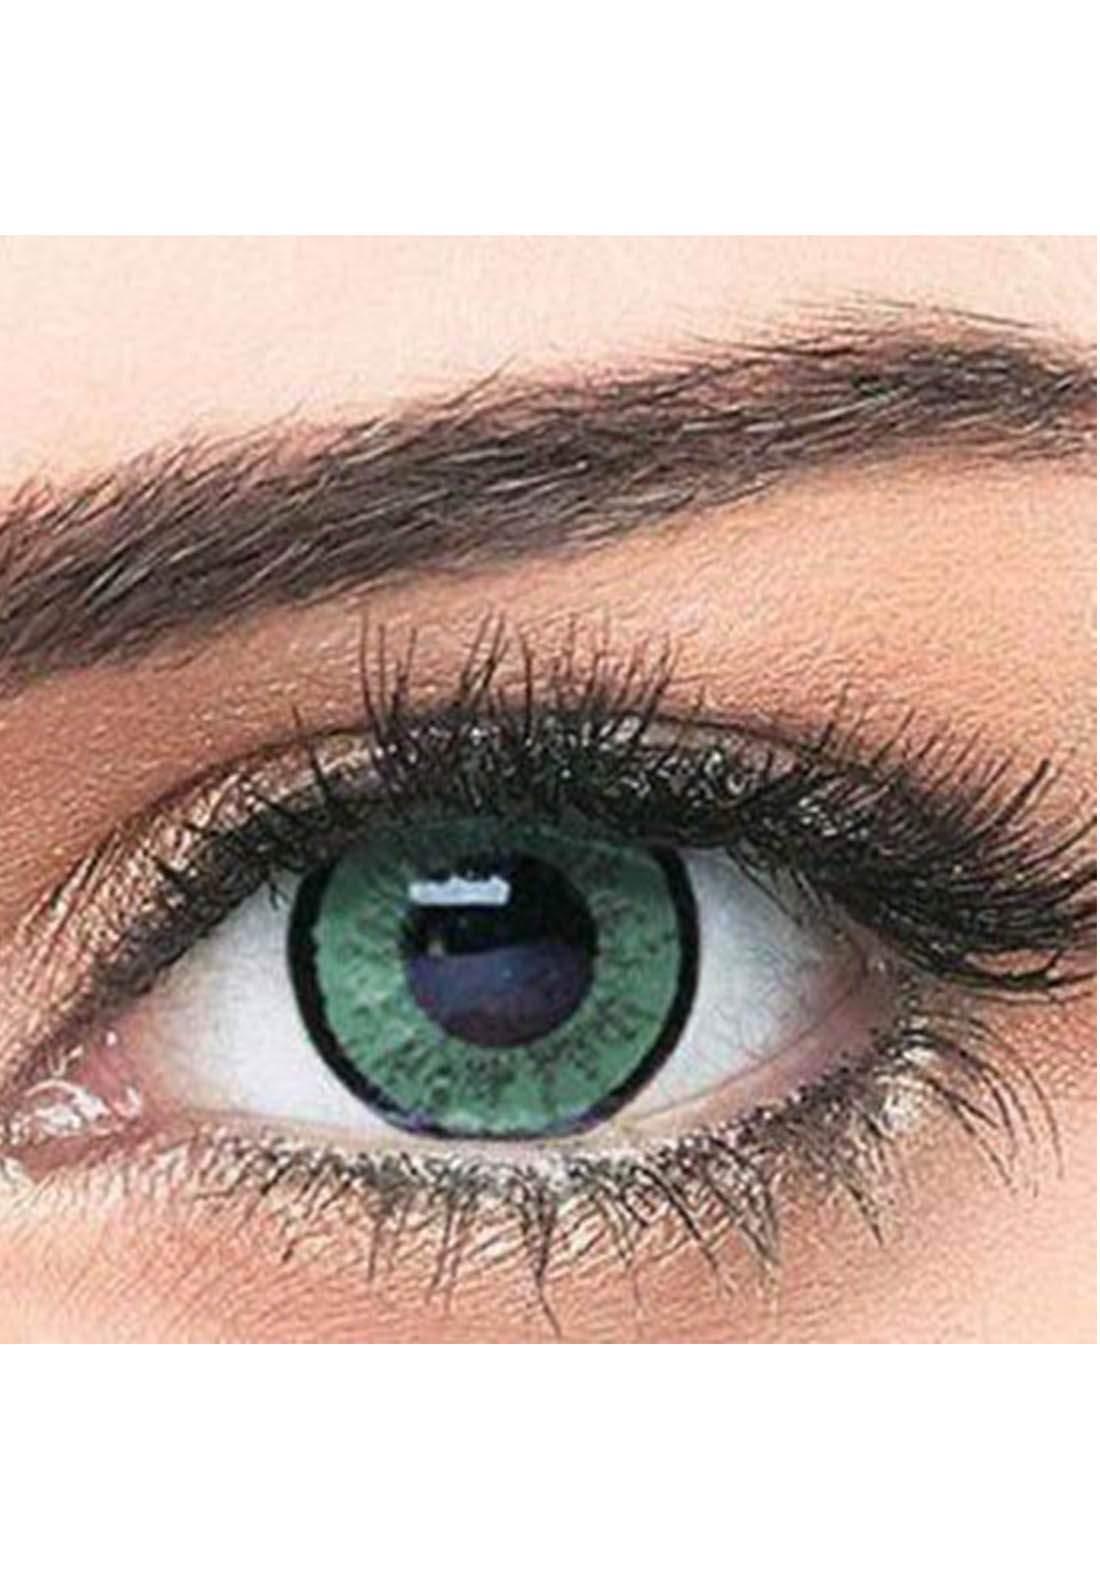 Bella Classic 301010 Contact Lenses 3 Months Use Elegance - Green  No.10 عدسات لاصقة